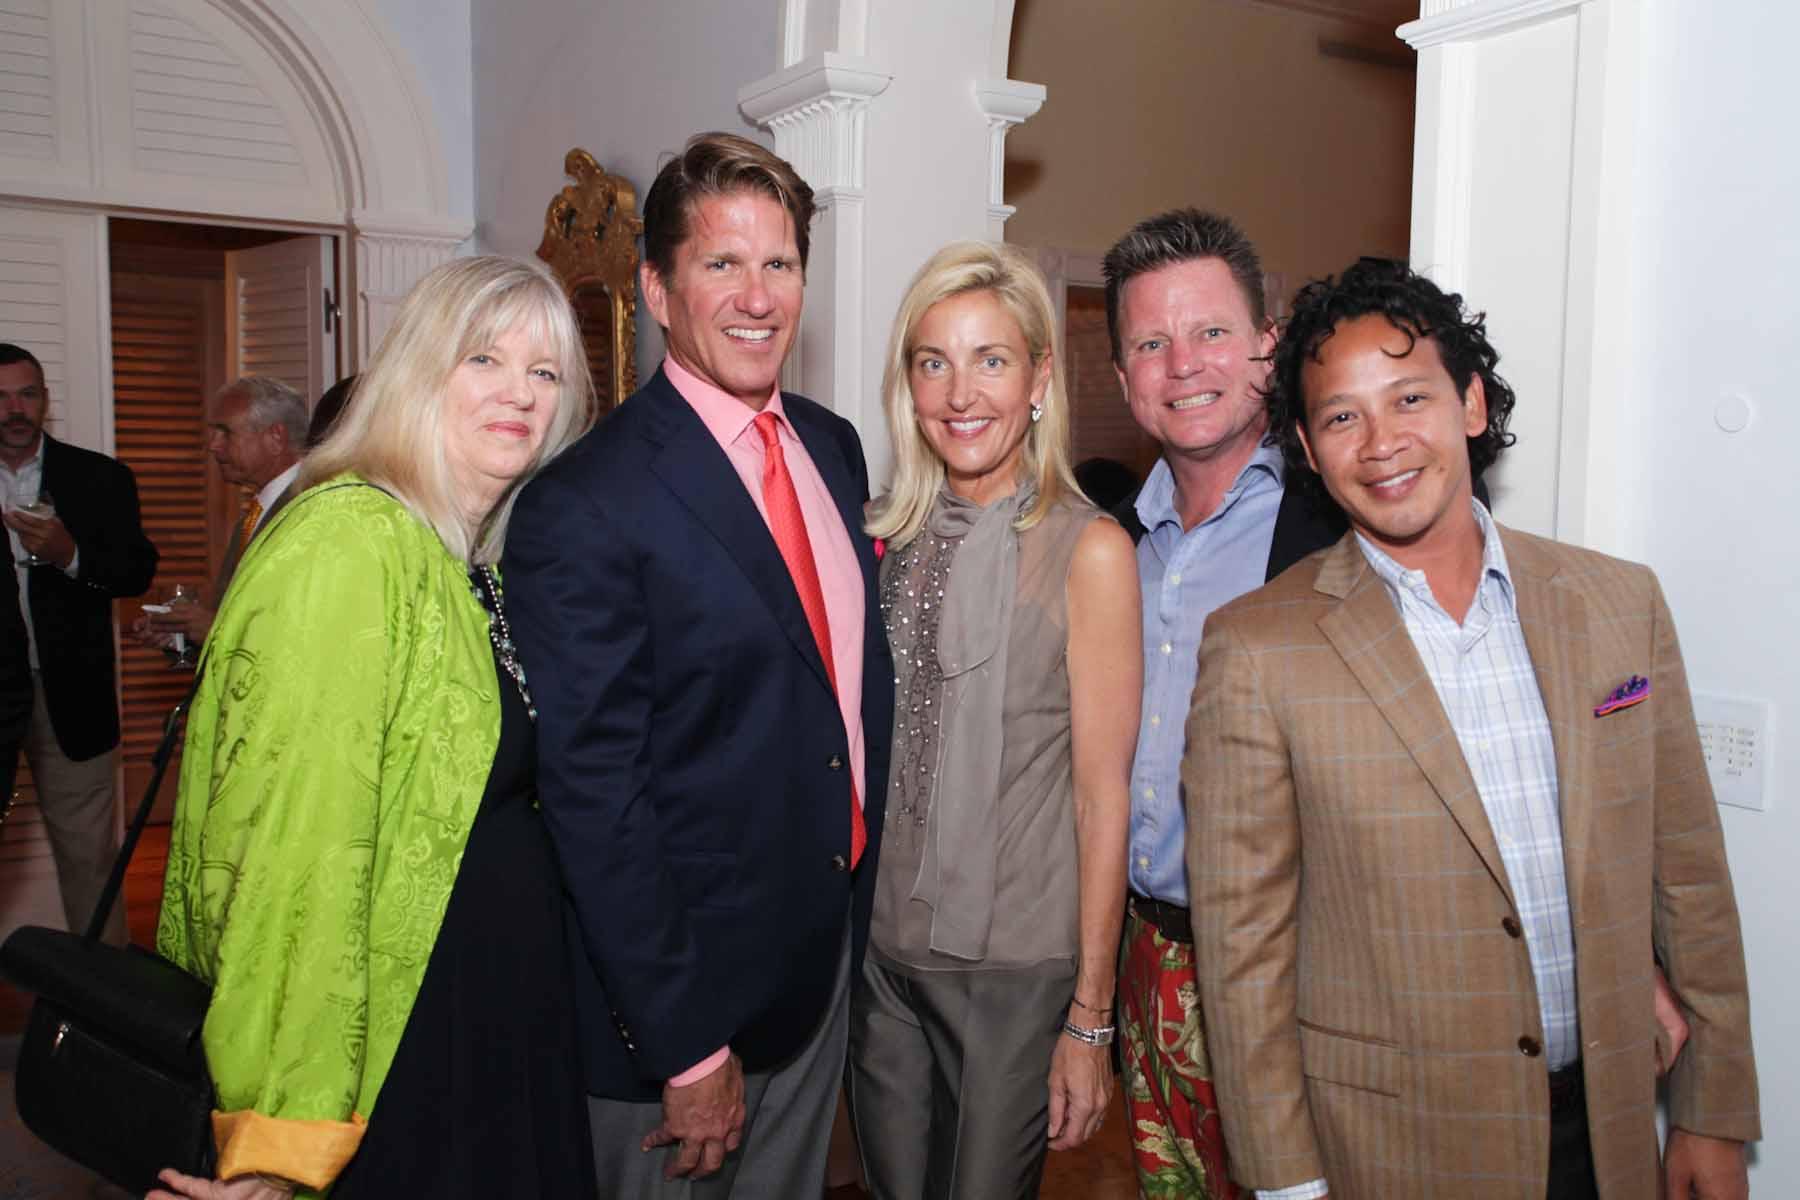 03 Diane N. Weiss, Greg Connors, Karin Luter, Tim Johnson, and Fernando Wong